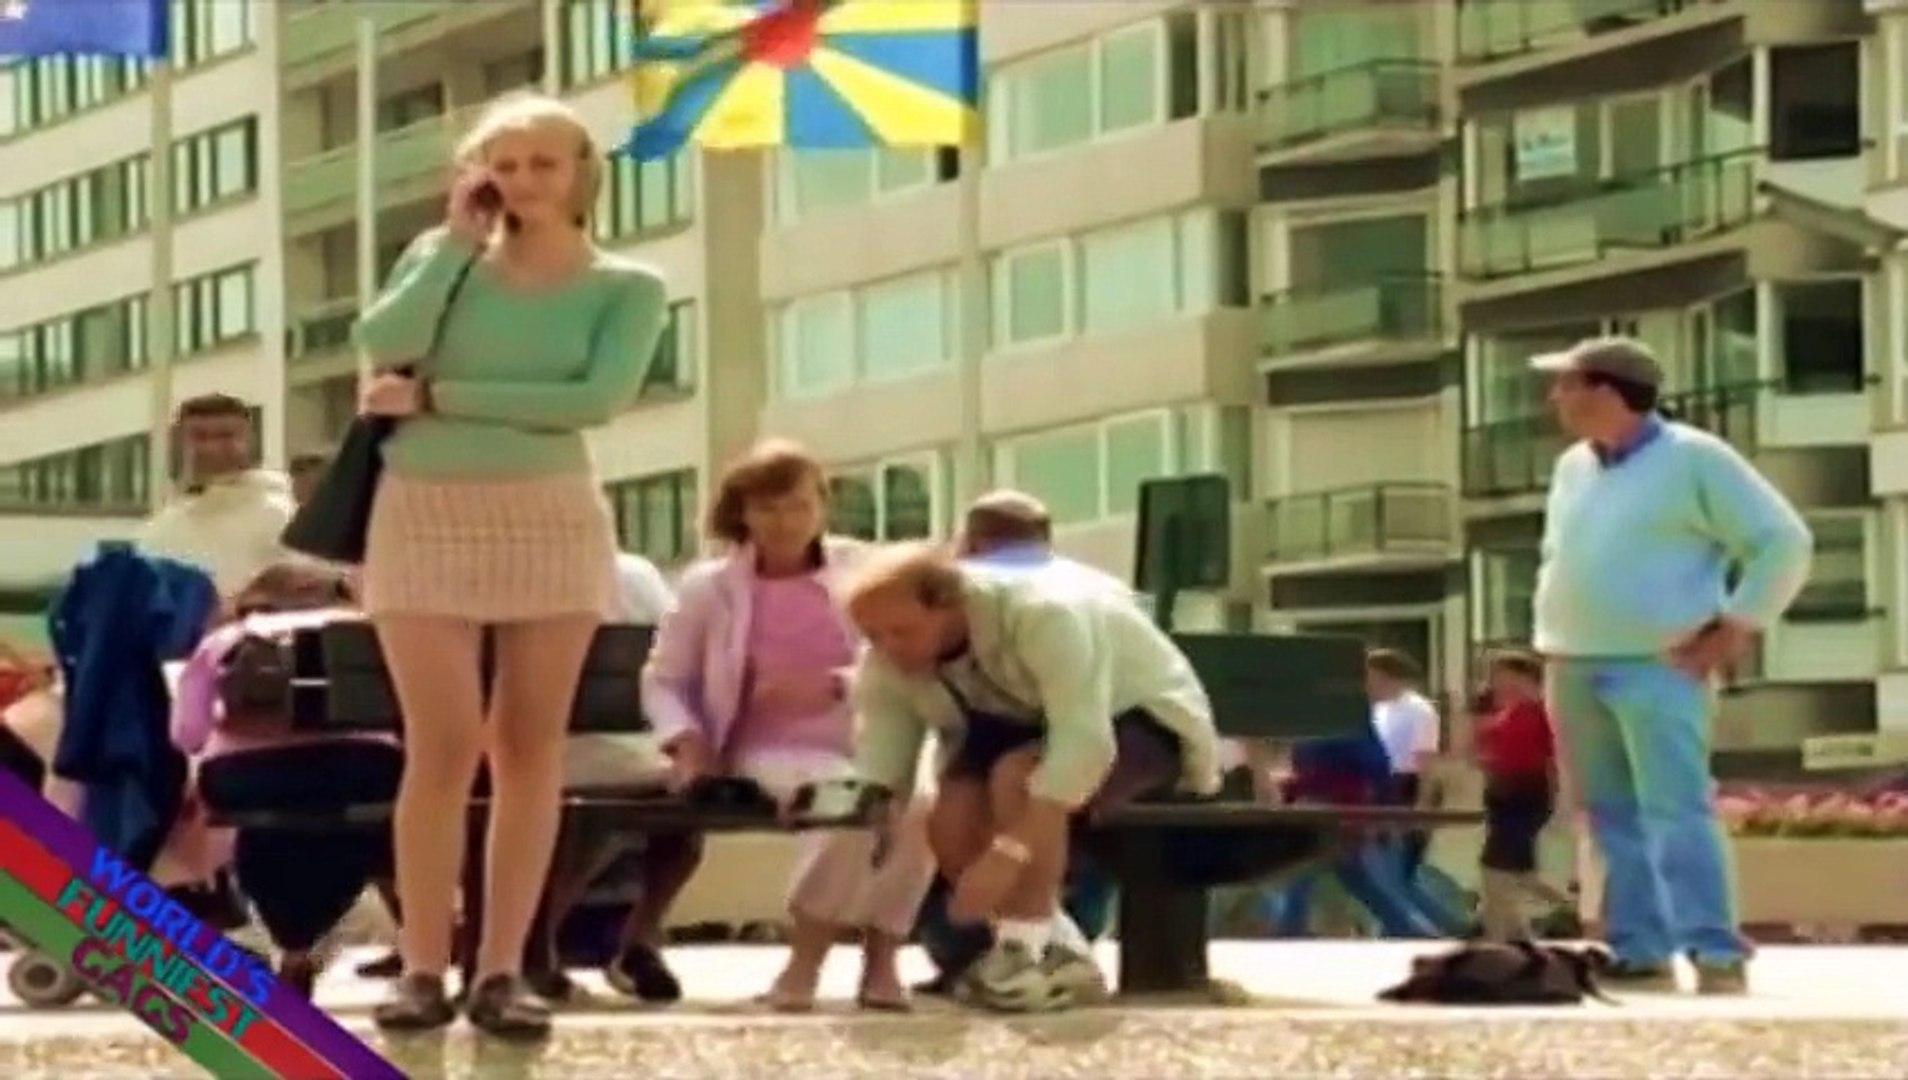 FUNNY Prank Videos - Sexy Skirt Prank - Sexy Women Dancing